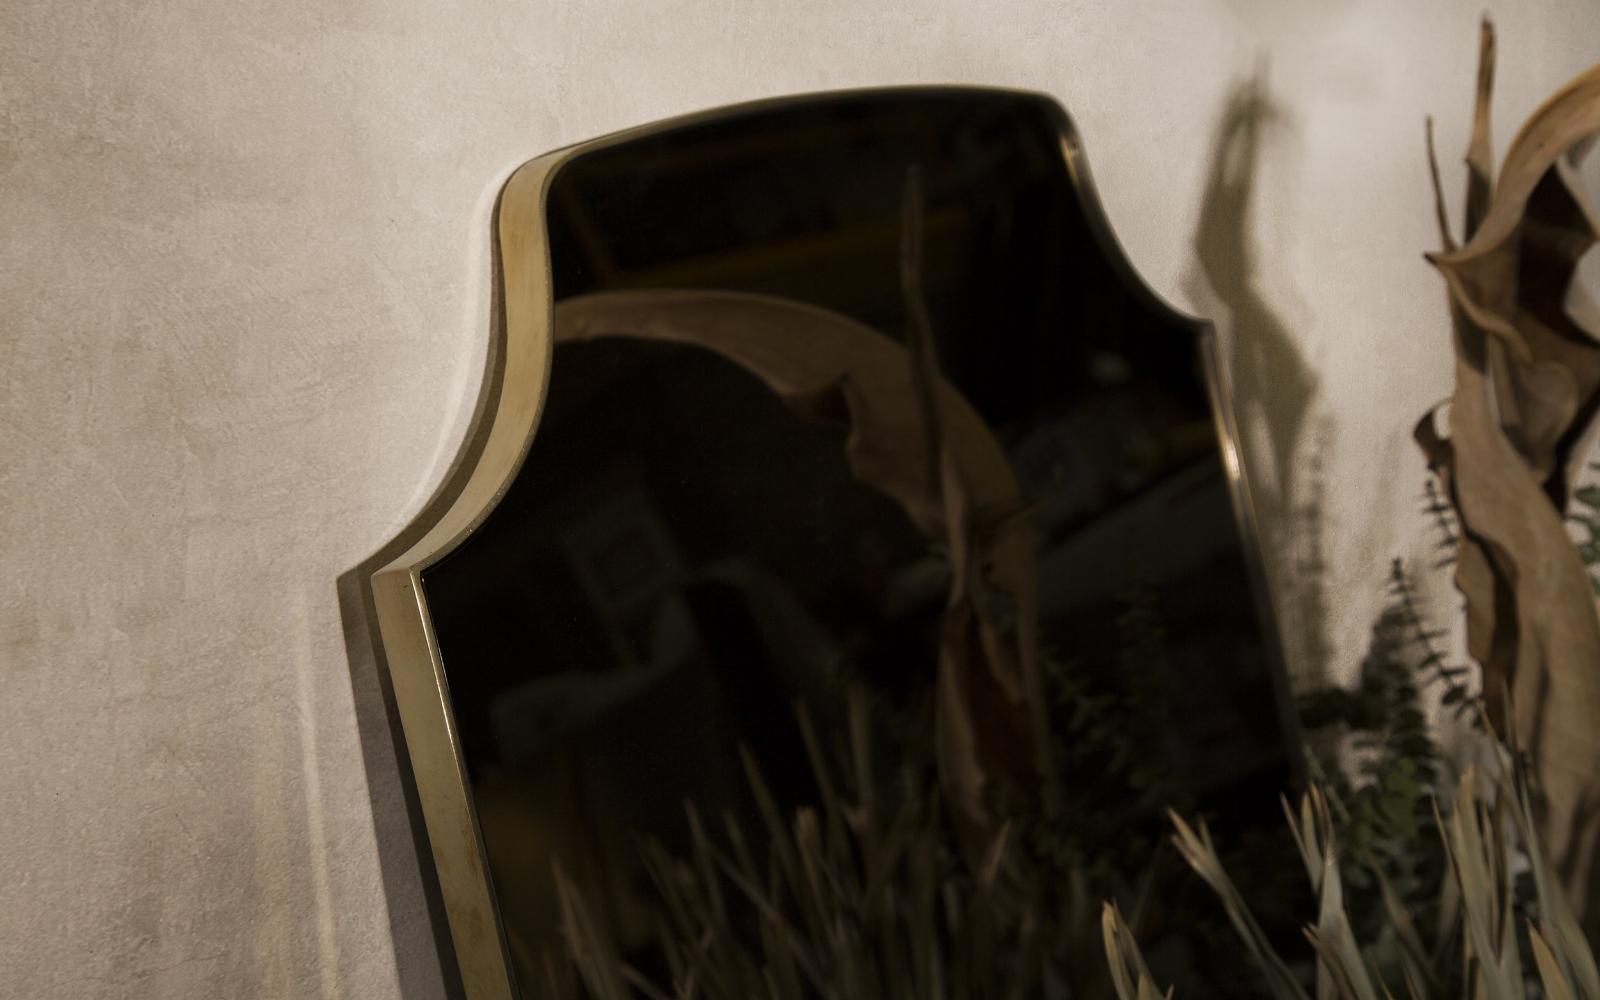 NOVOCASTRIAN_Aegis Brass Mirror 2.jpg